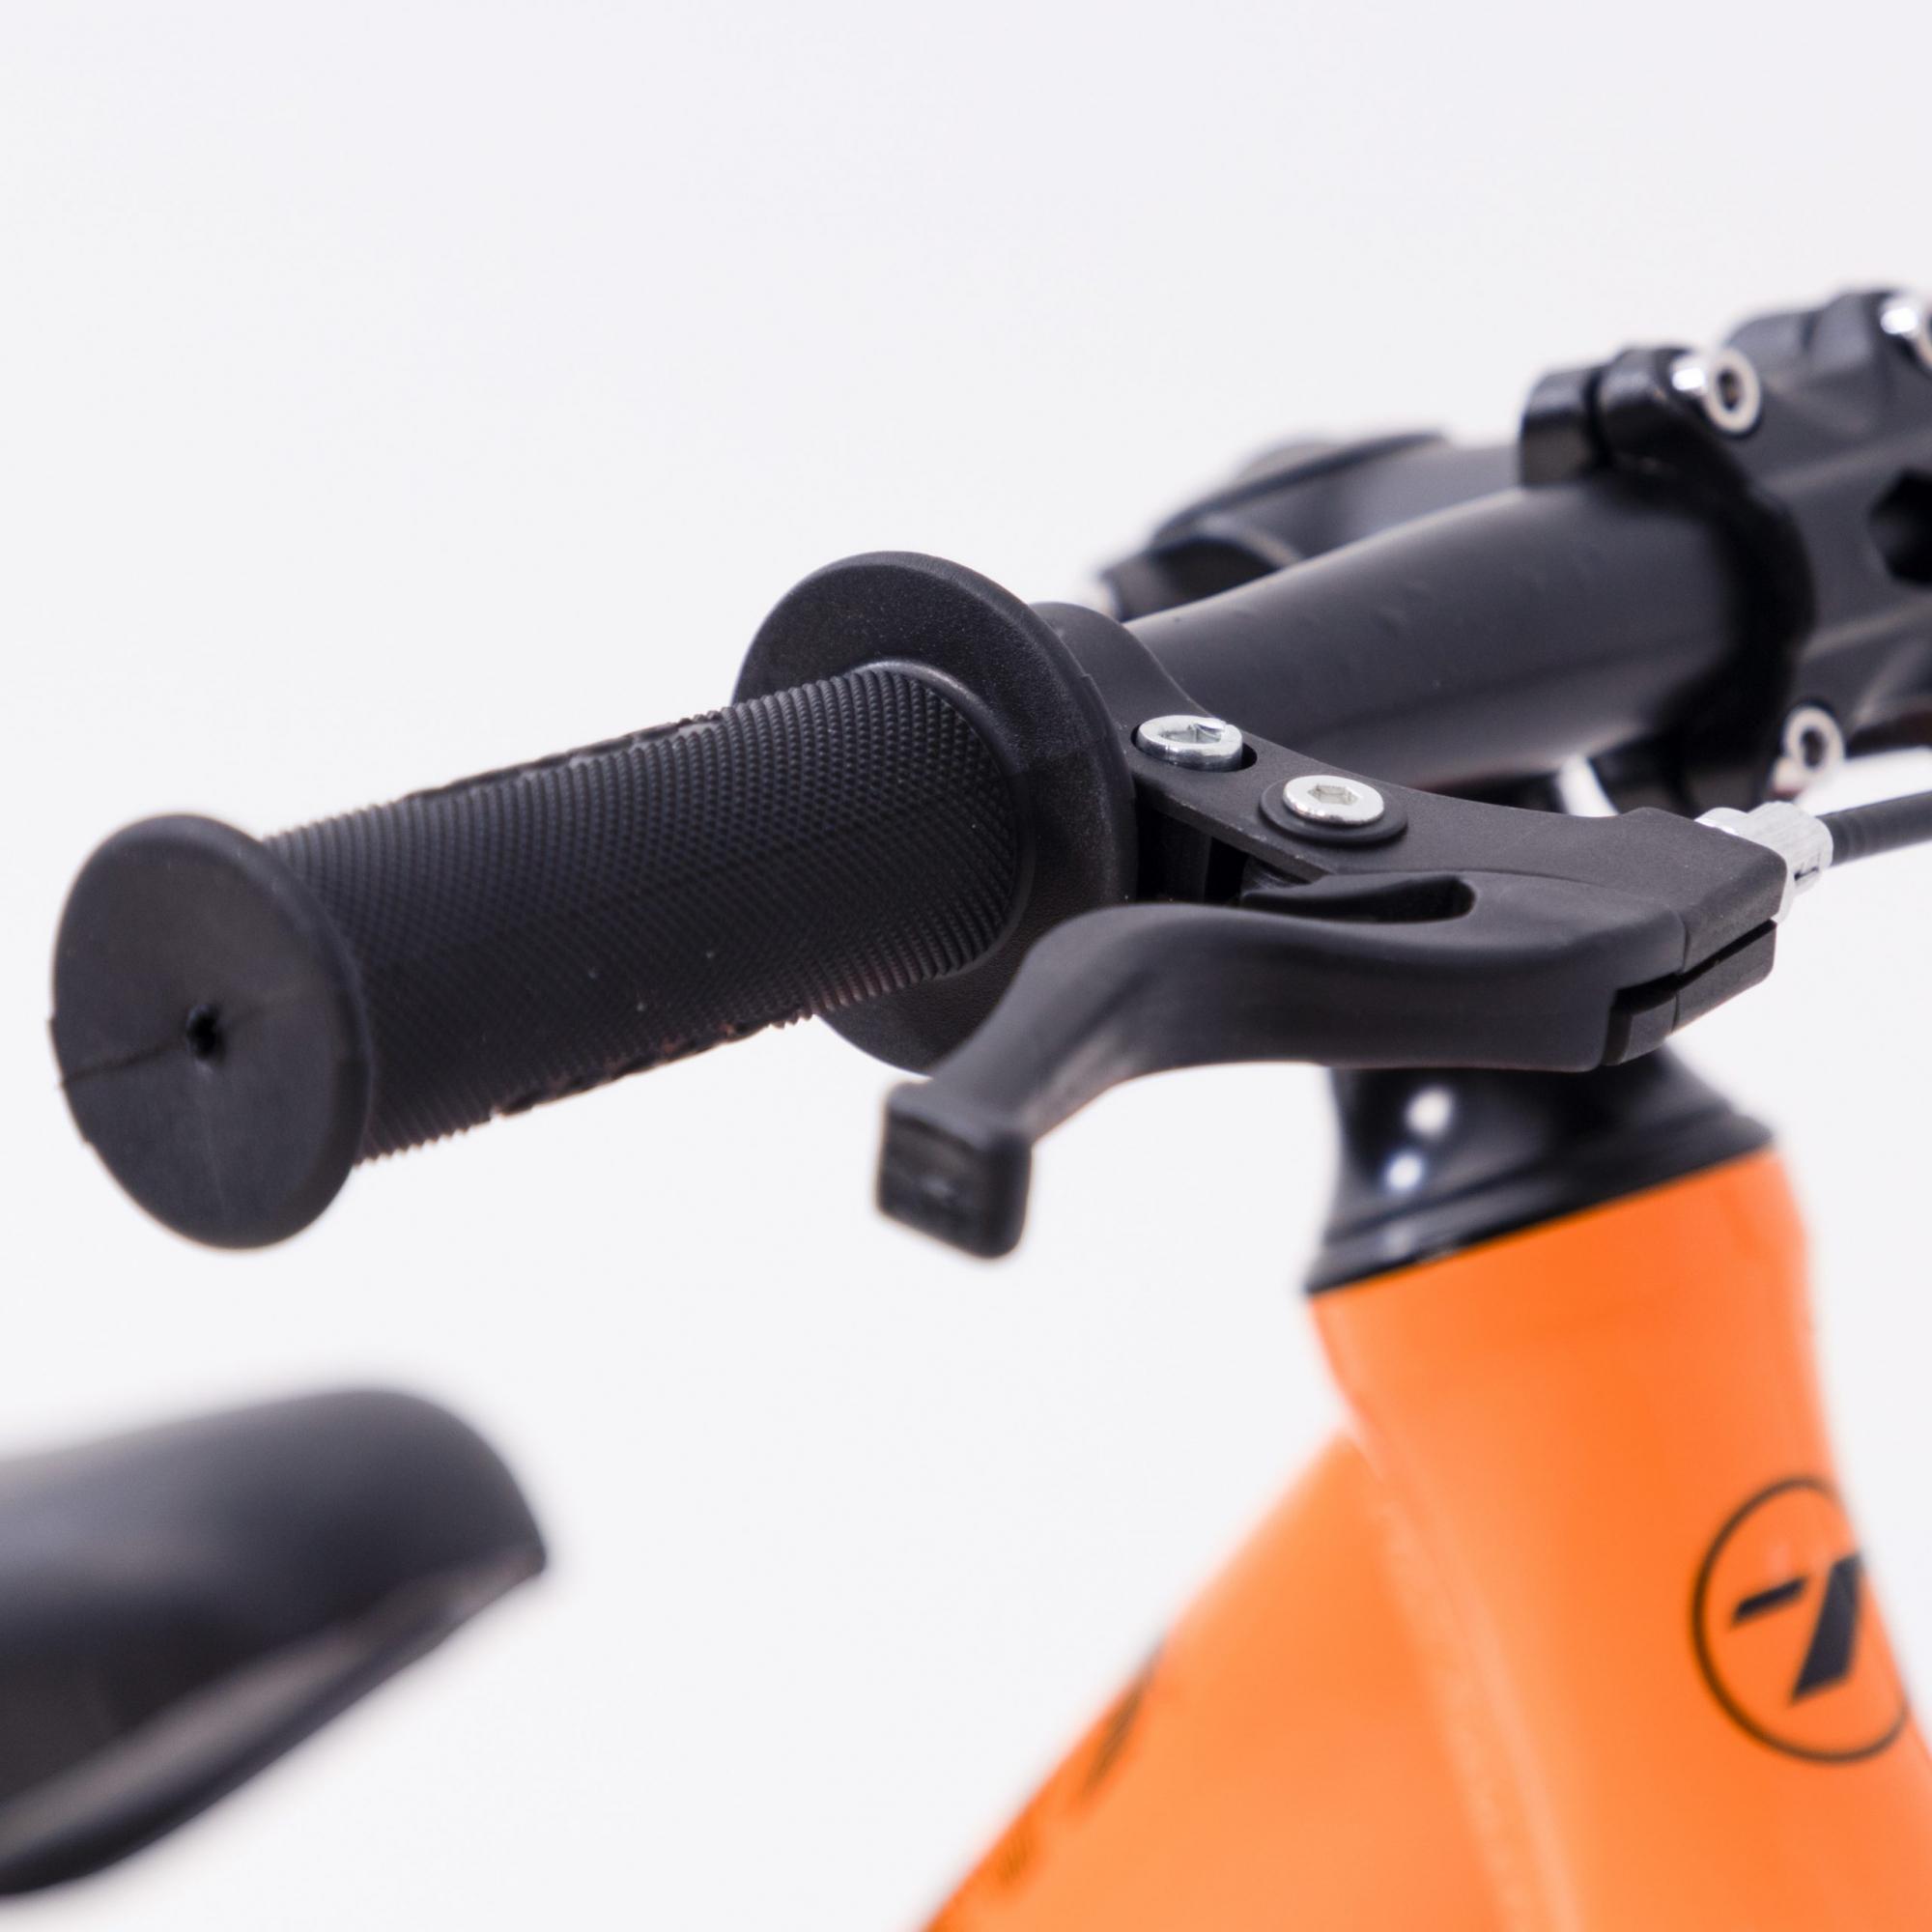 Bicicleta TSW Balance Motion Aro 12 Alumínio